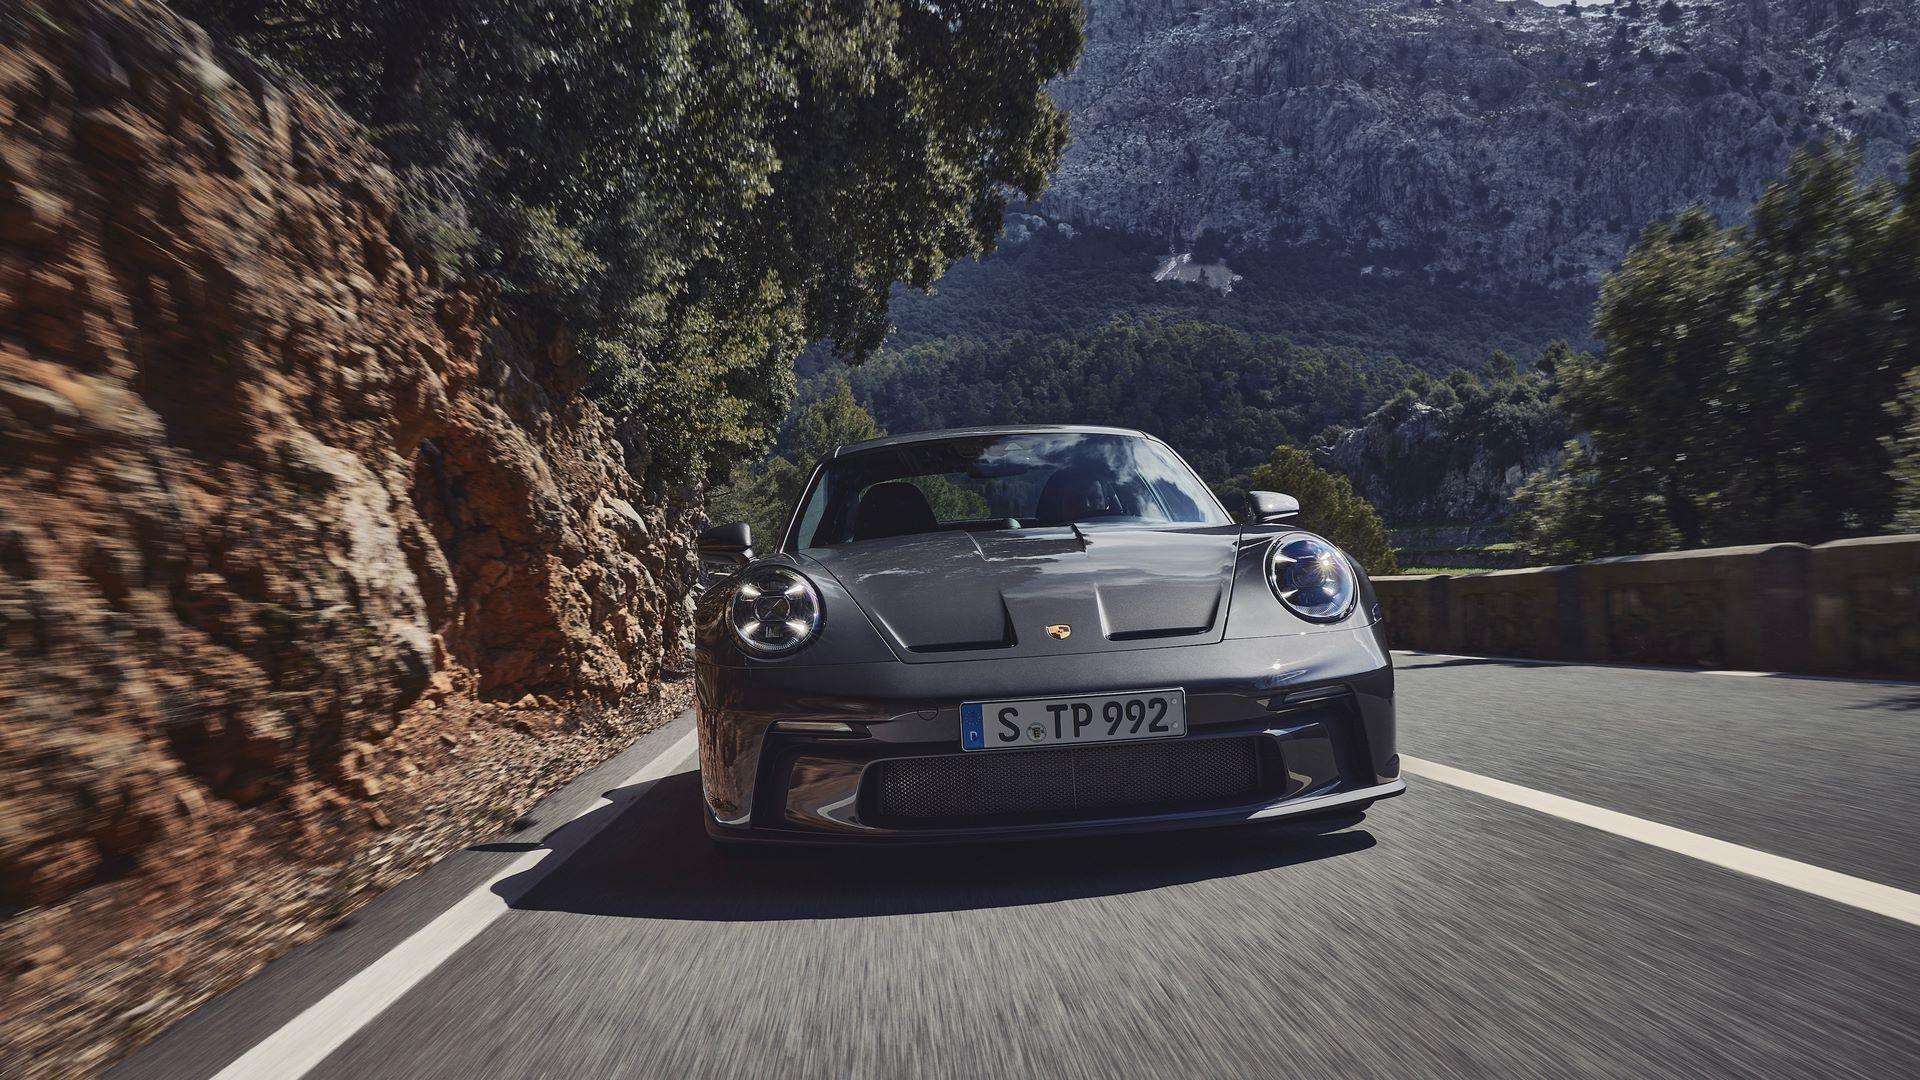 Porsche-911-GT3-Touring-Package-7